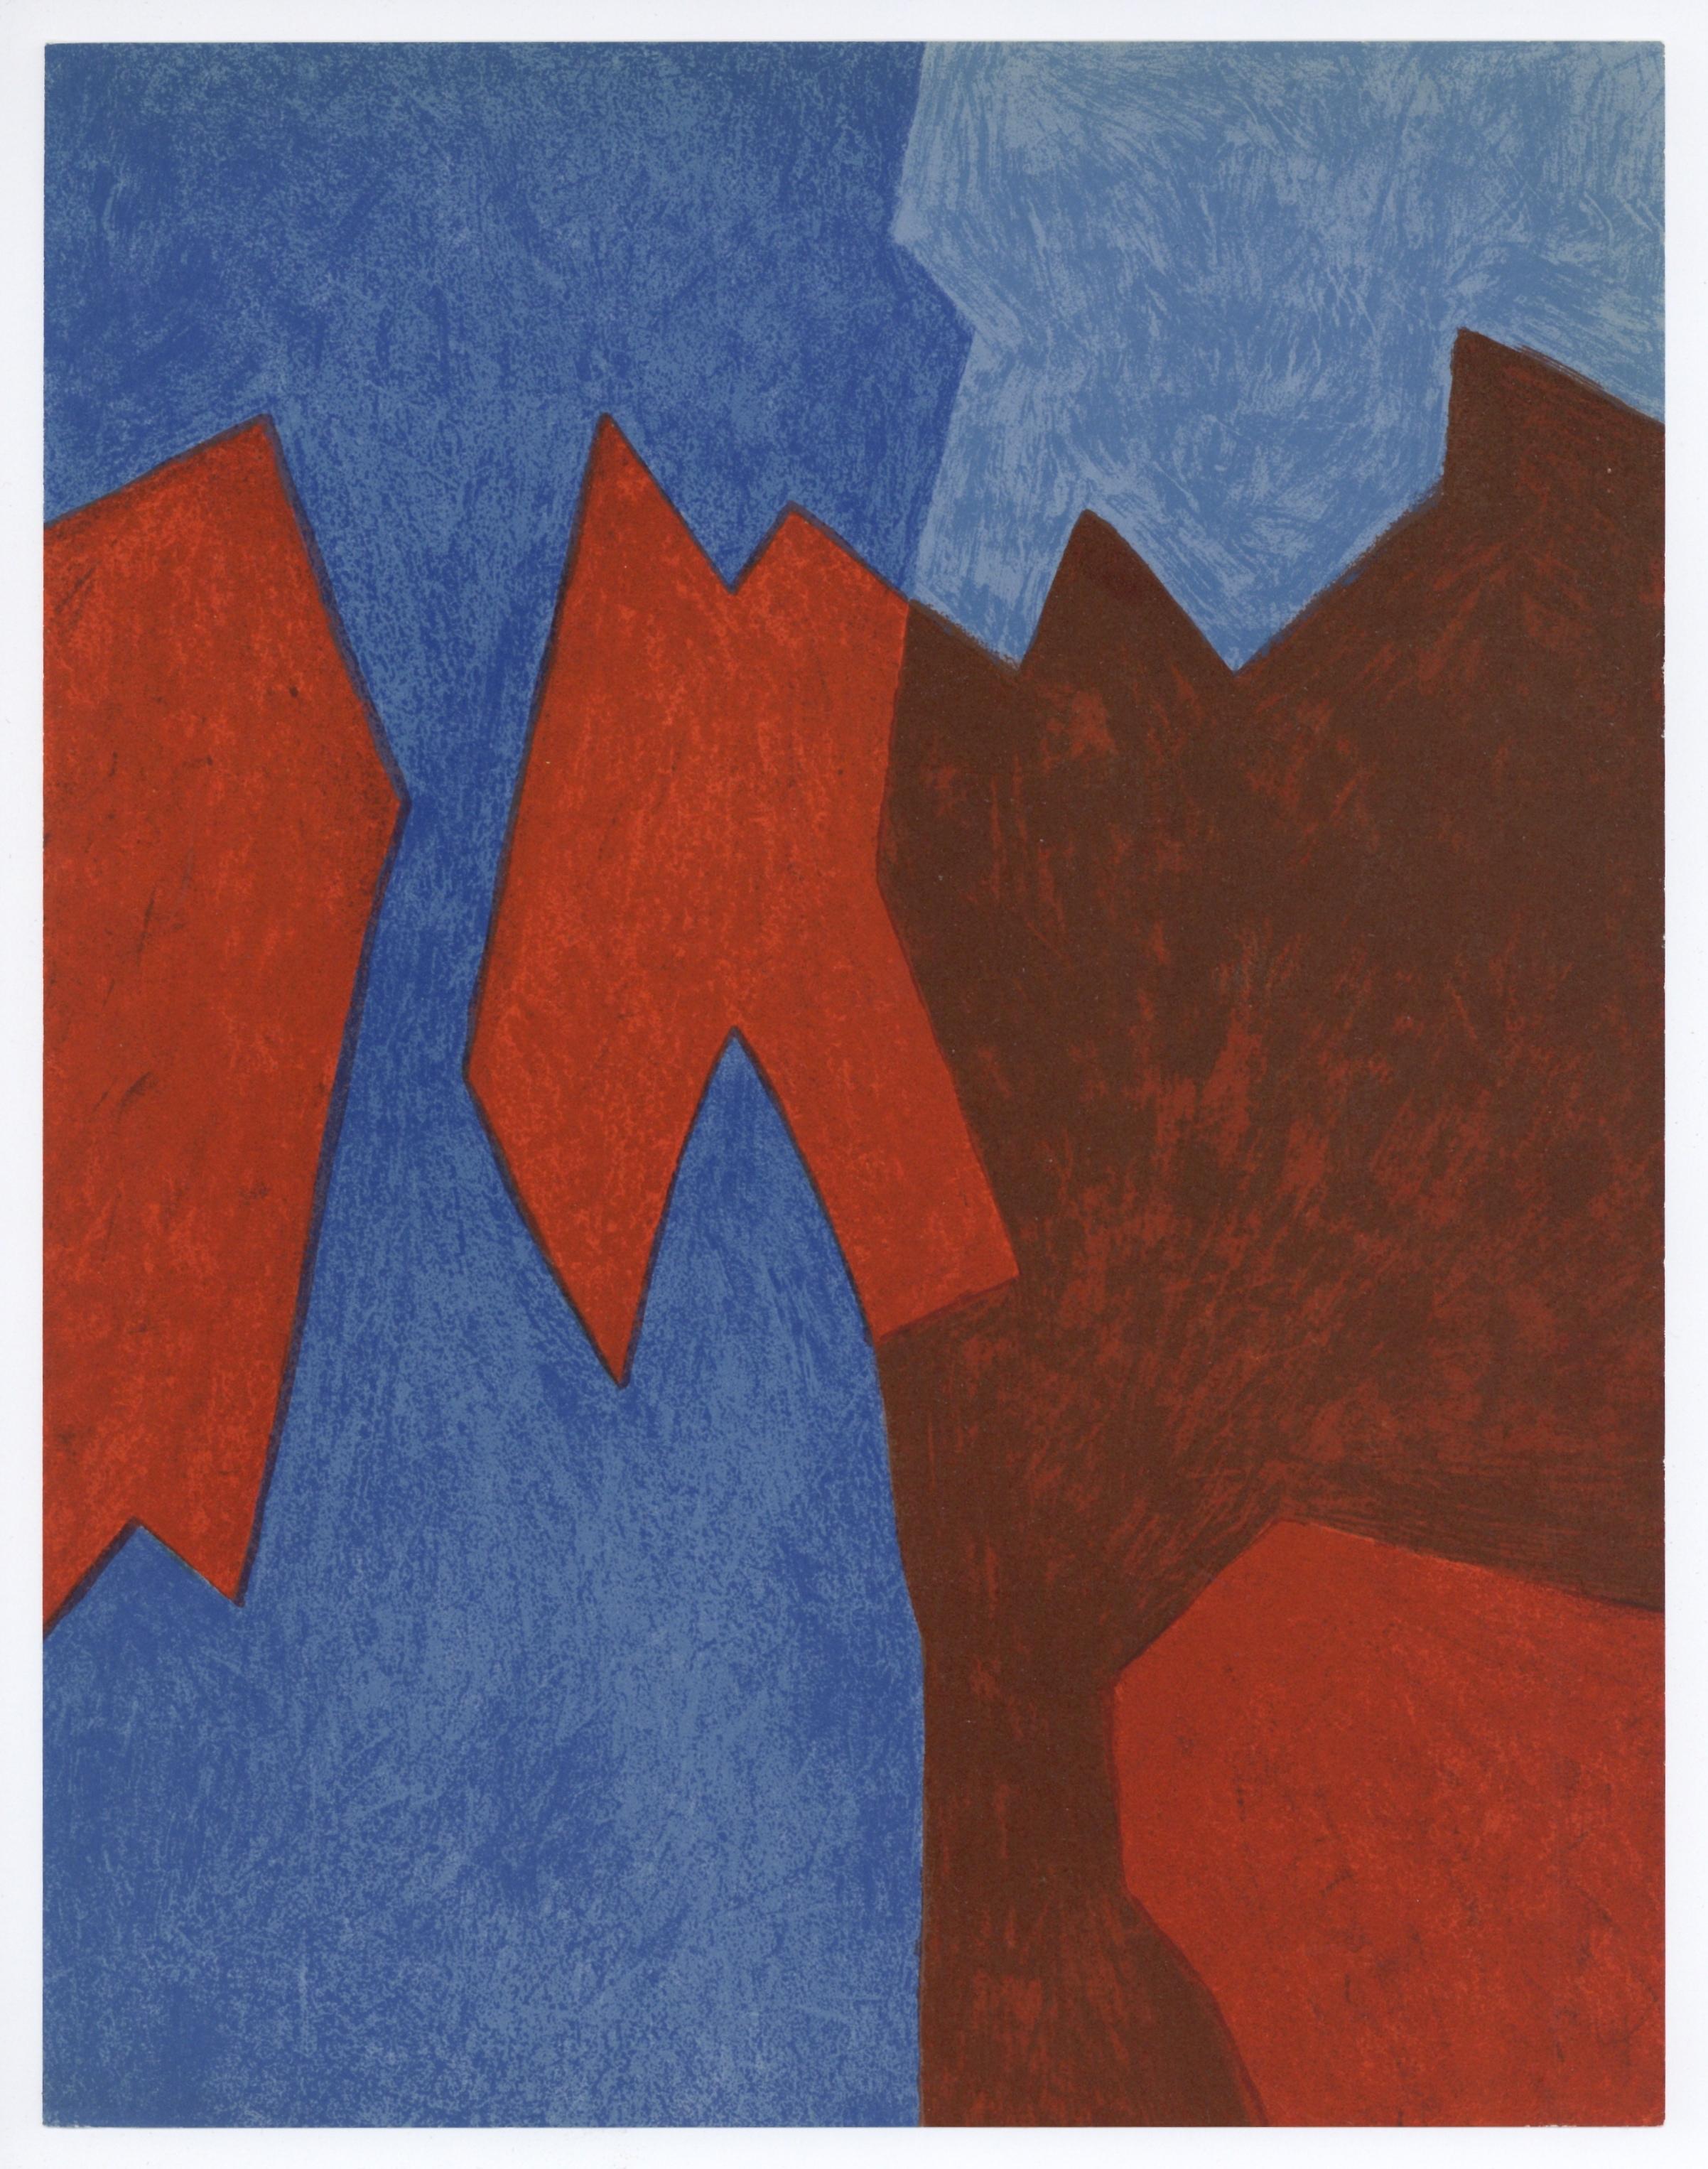 252f7d55aa9 Serge Poliakoff original lithograph tachisme